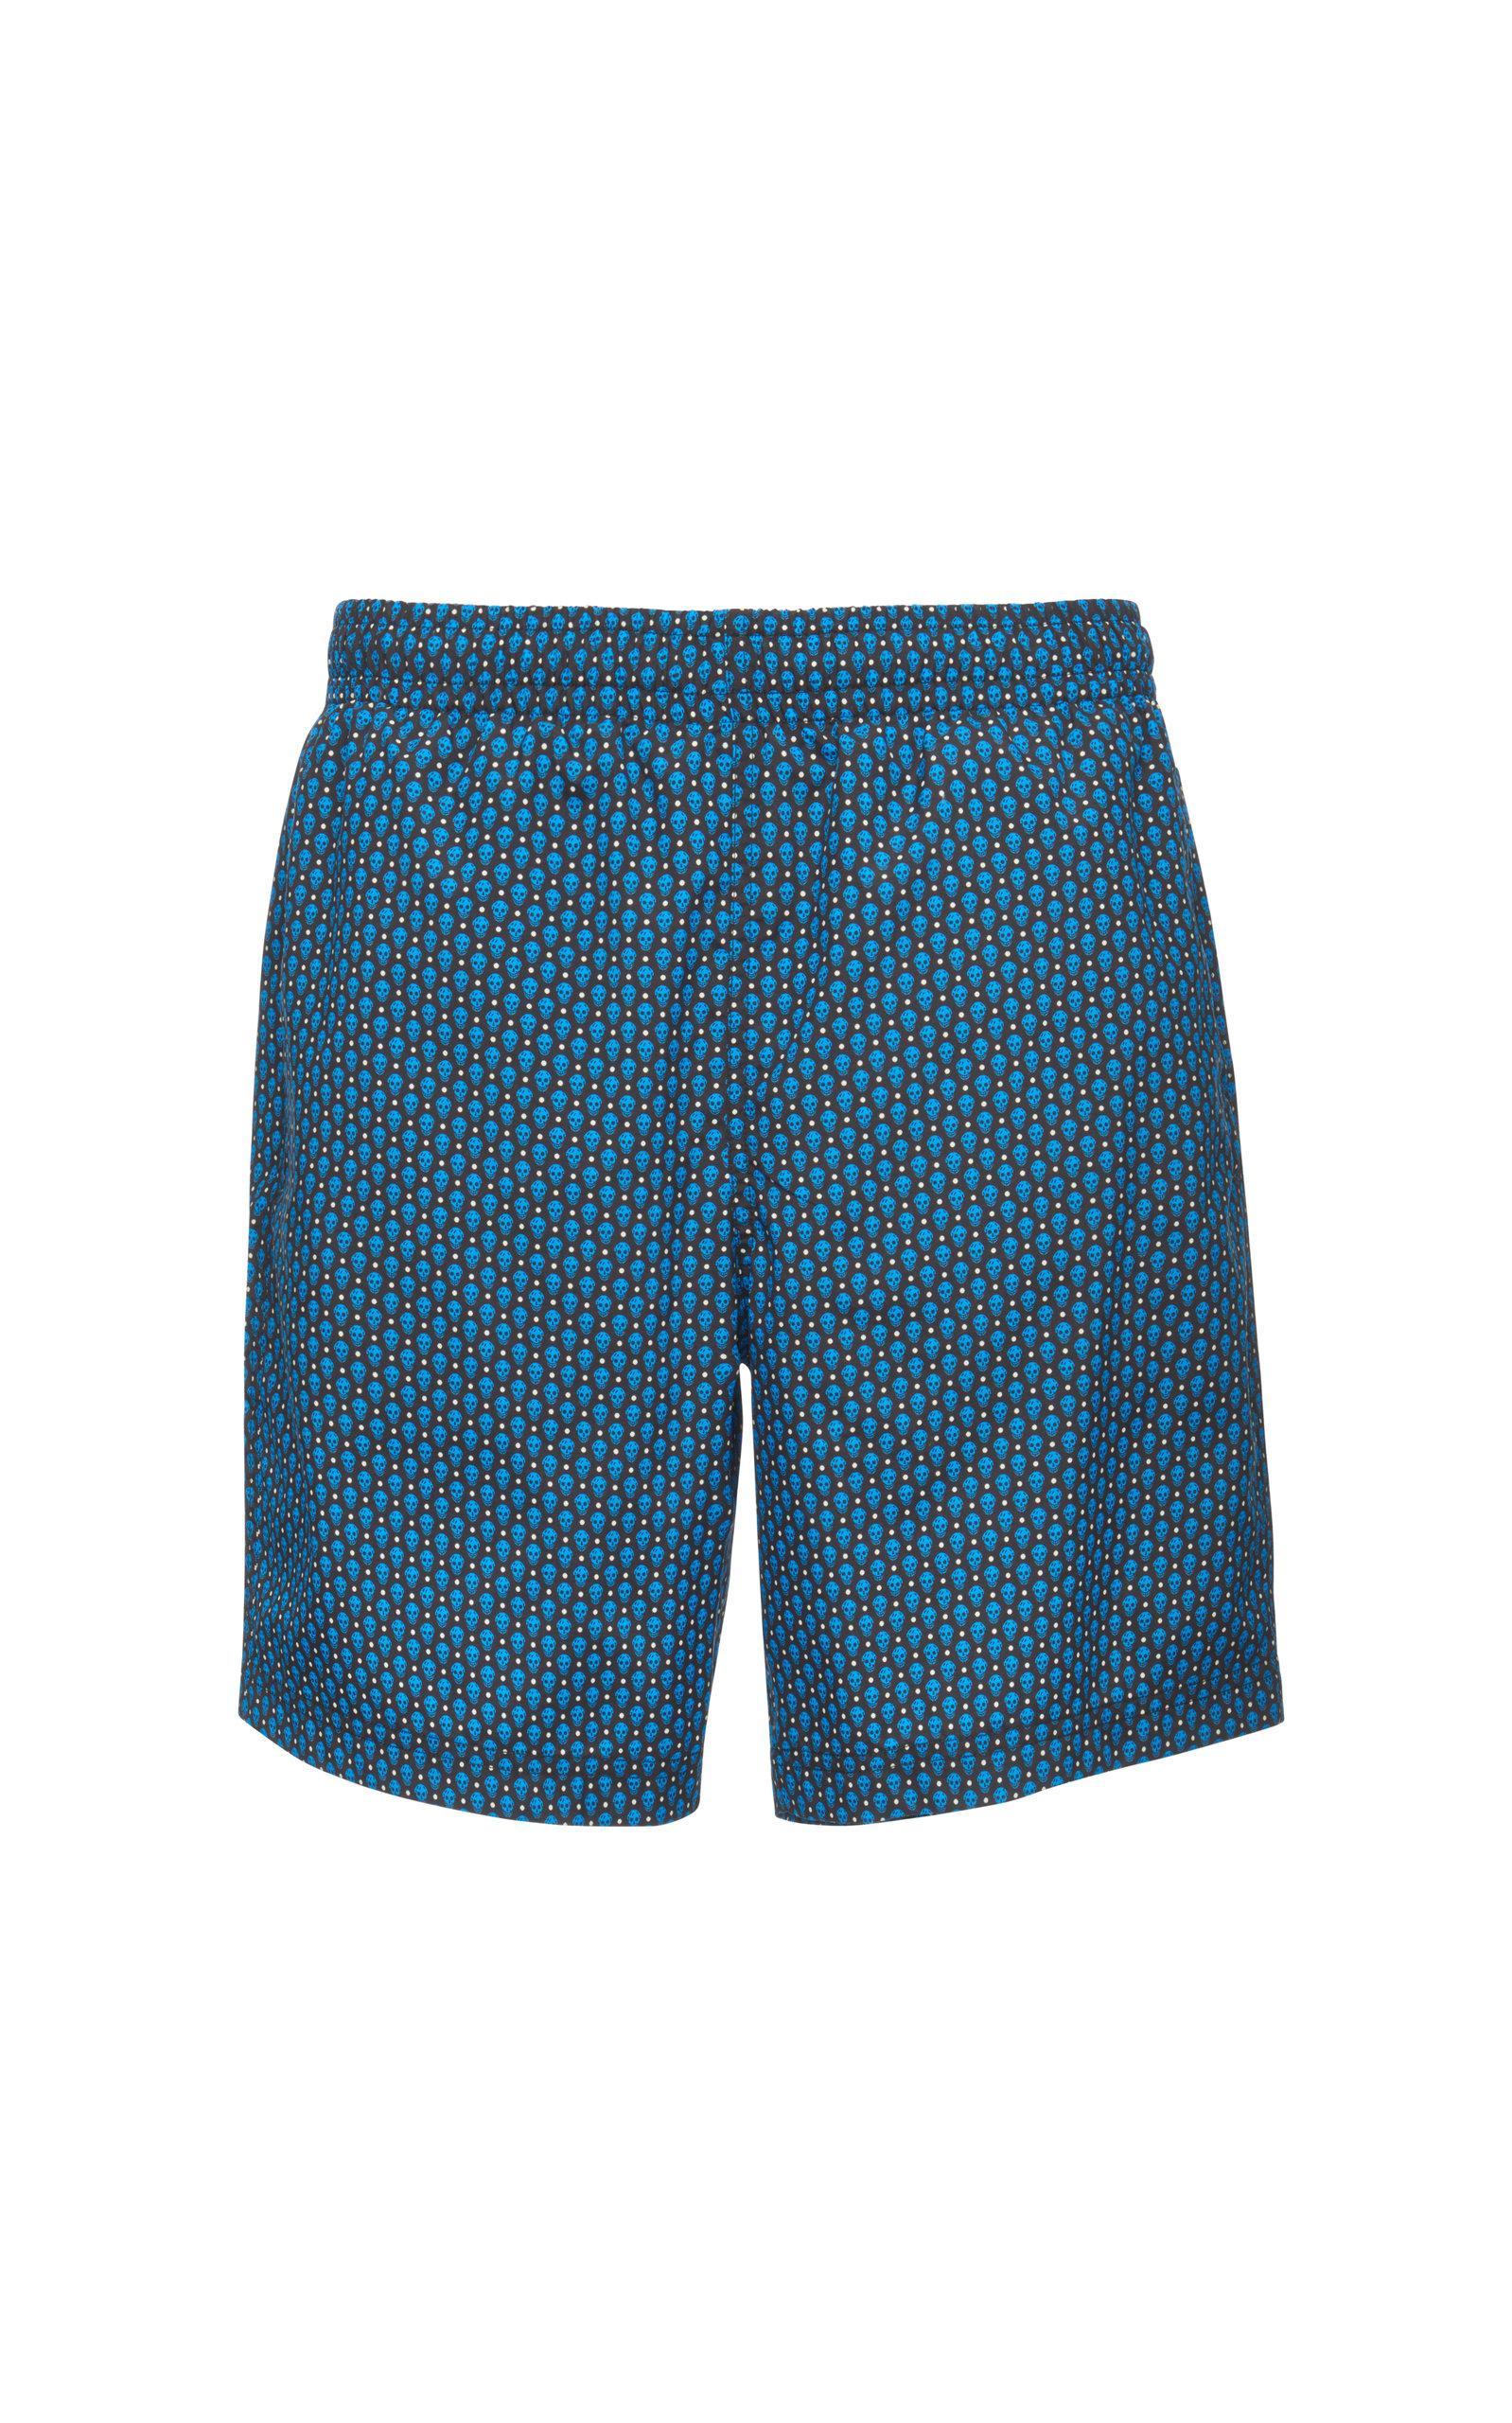 3bca383550 Lyst - Alexander McQueen Skull-print Swim Shorts in Blue for Men